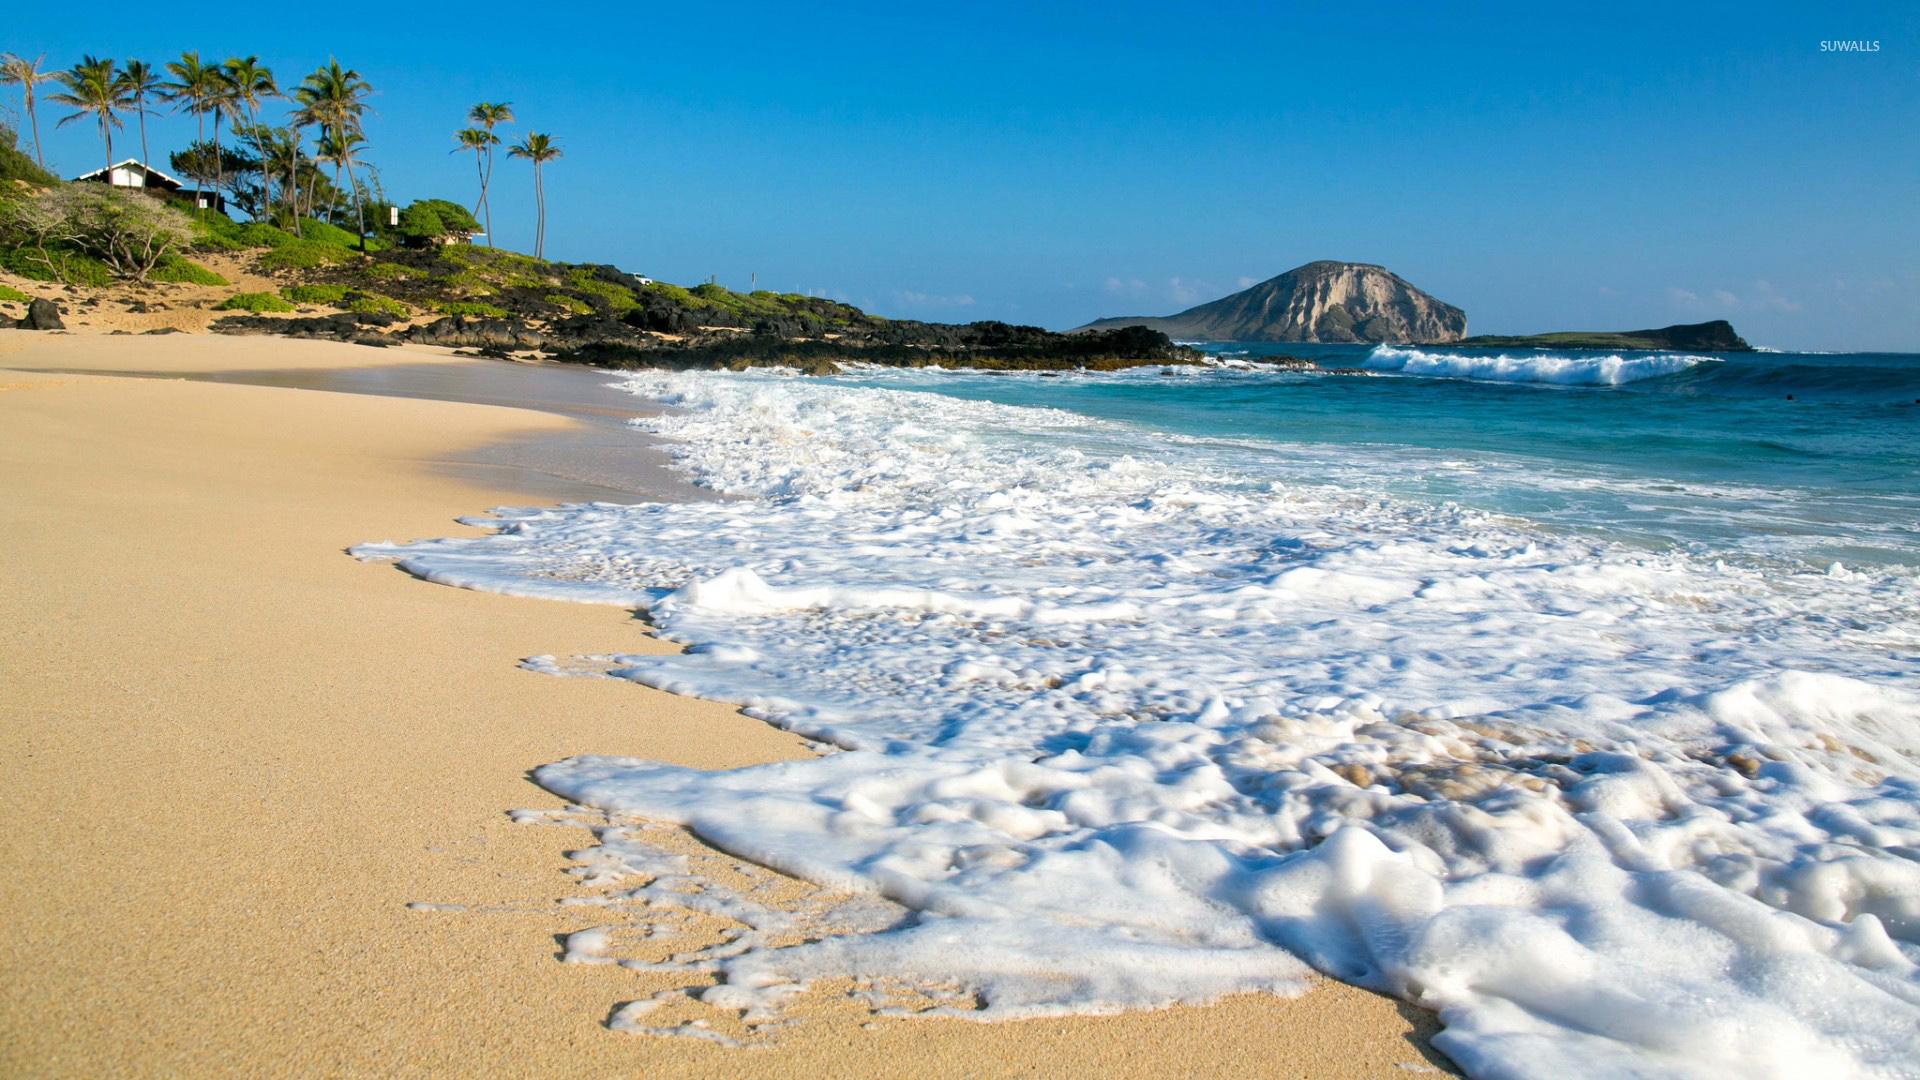 Sandy Beach Wallpaper: Foamy Sandy Beach Wallpaper